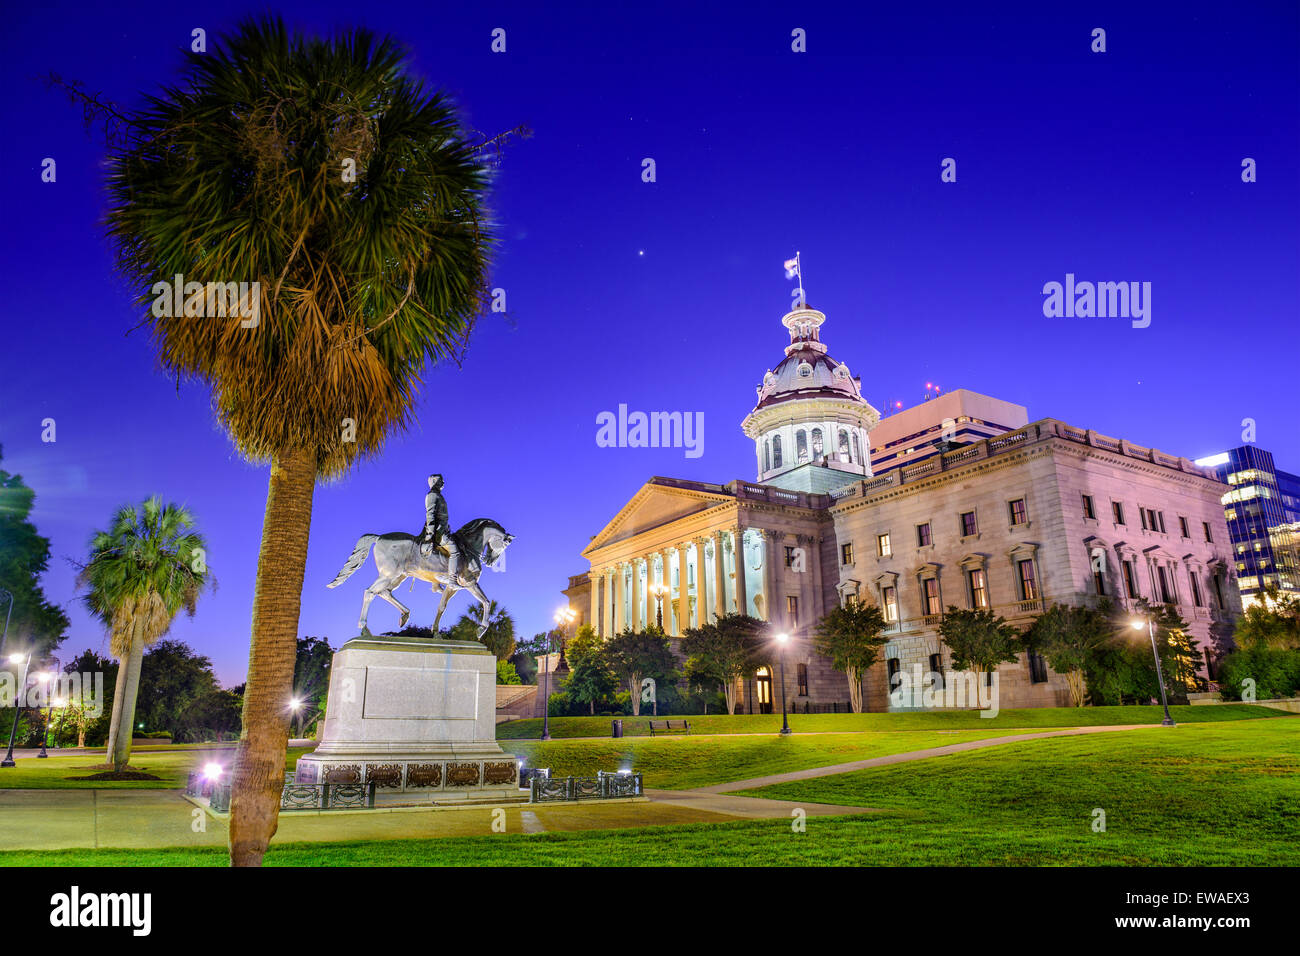 Columbia, South Carolina, USA im Repräsentantenhaus. Stockbild